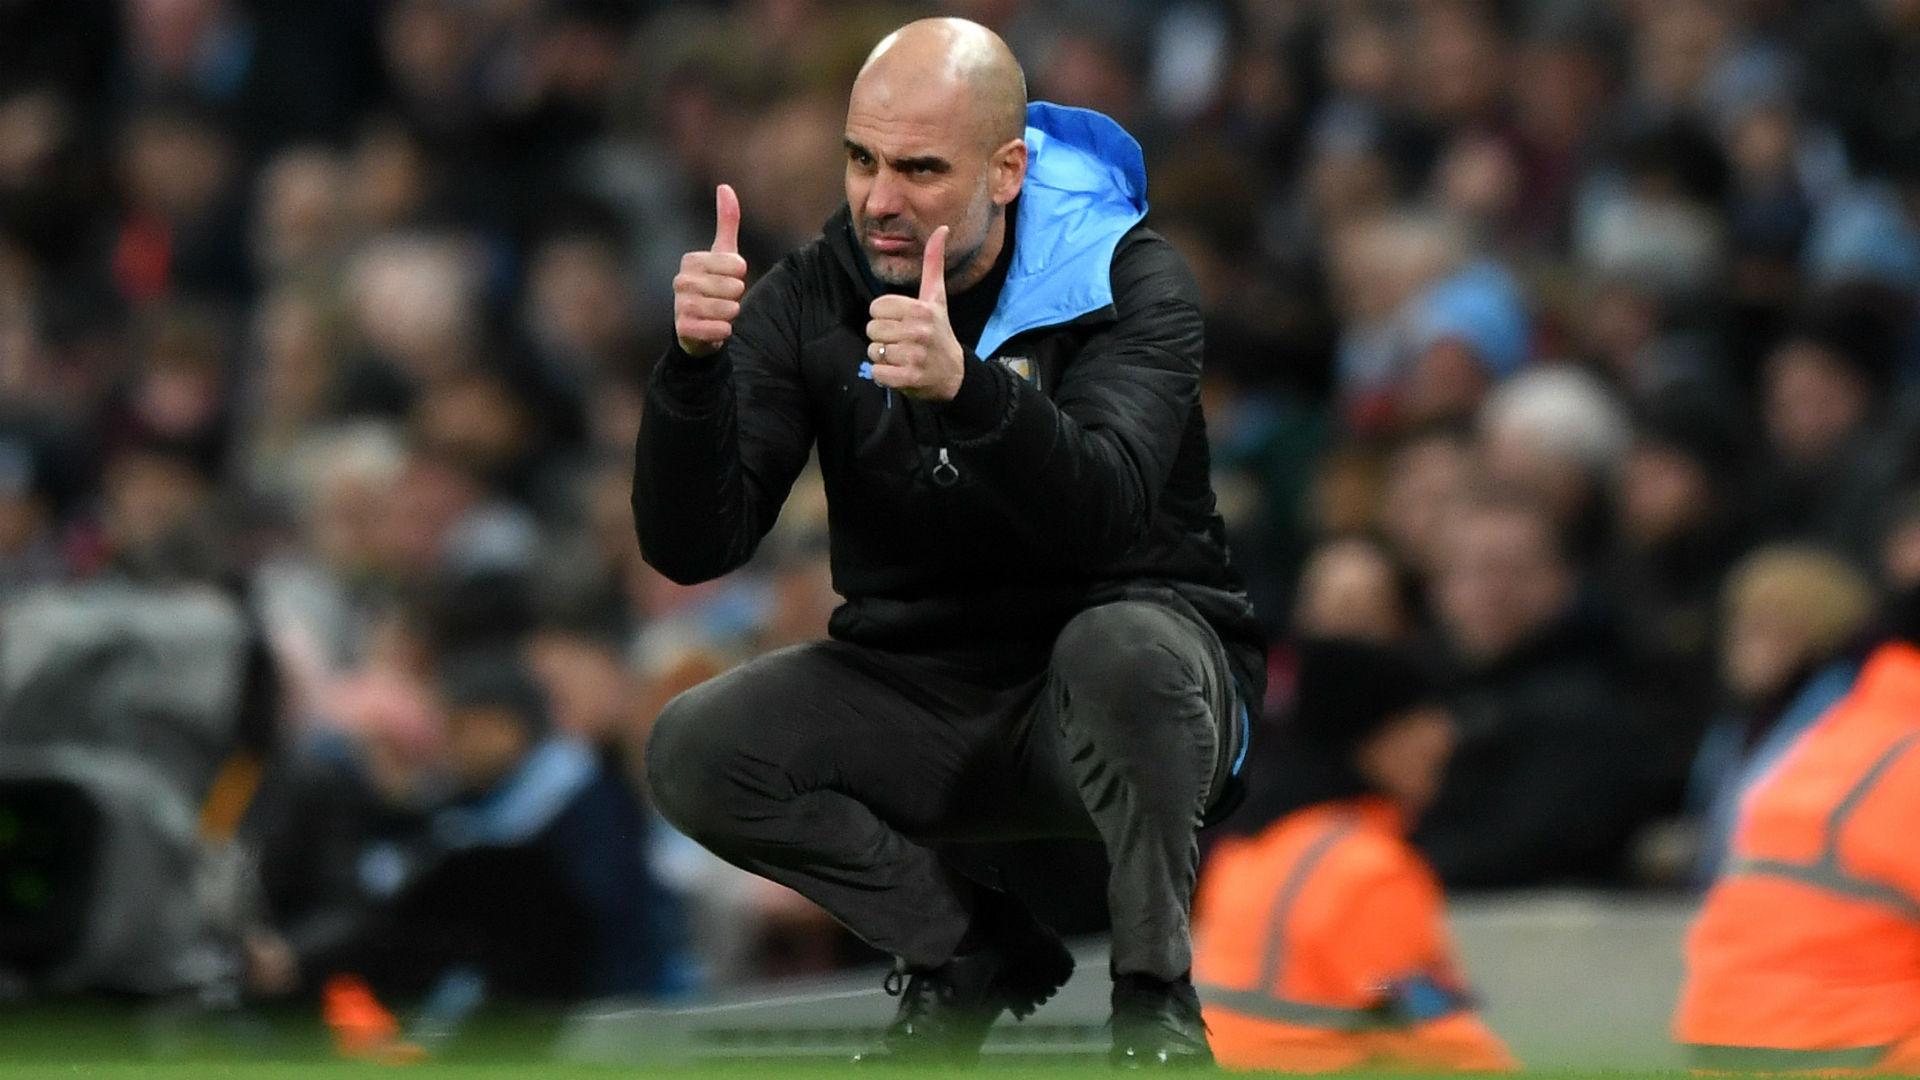 Manchester City 0-1 Manchester United (3-2 agg): Guardiola's men into EFL Cup final despite defeat